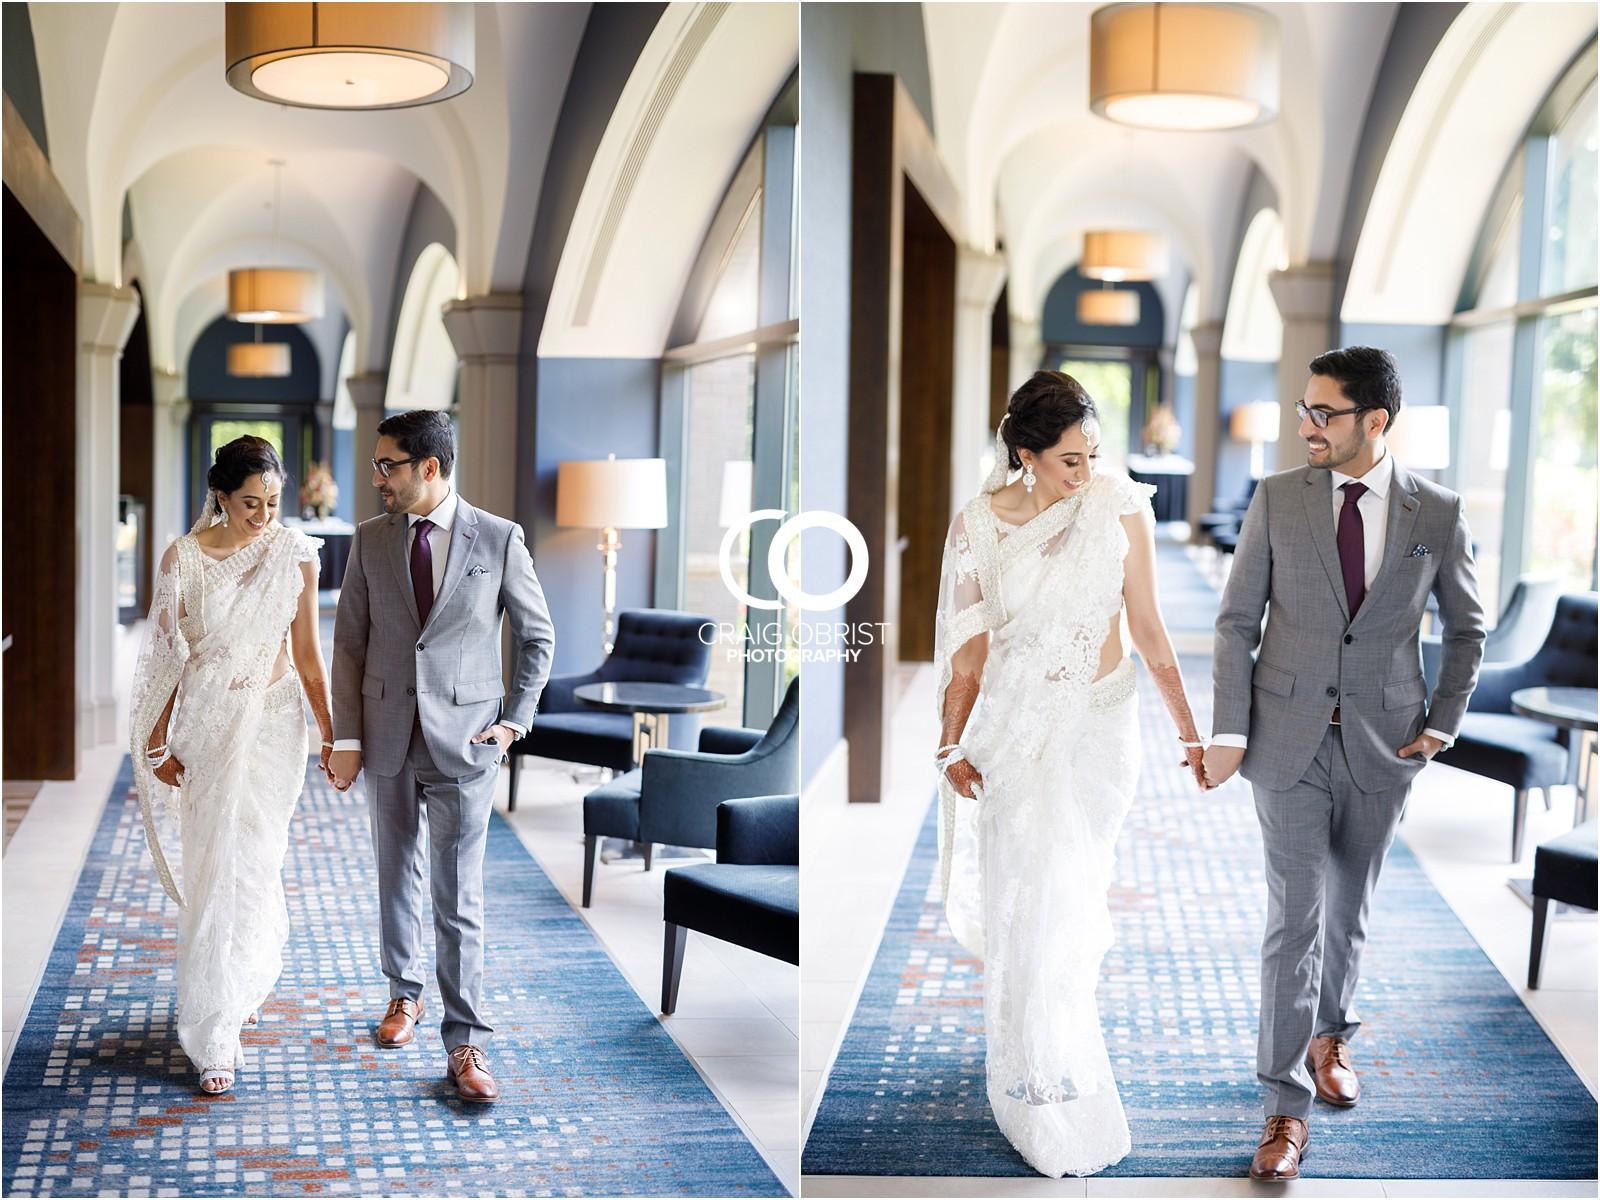 Atlanta Hilton Northeast South Asian Wedding Portraits_0019.jpg